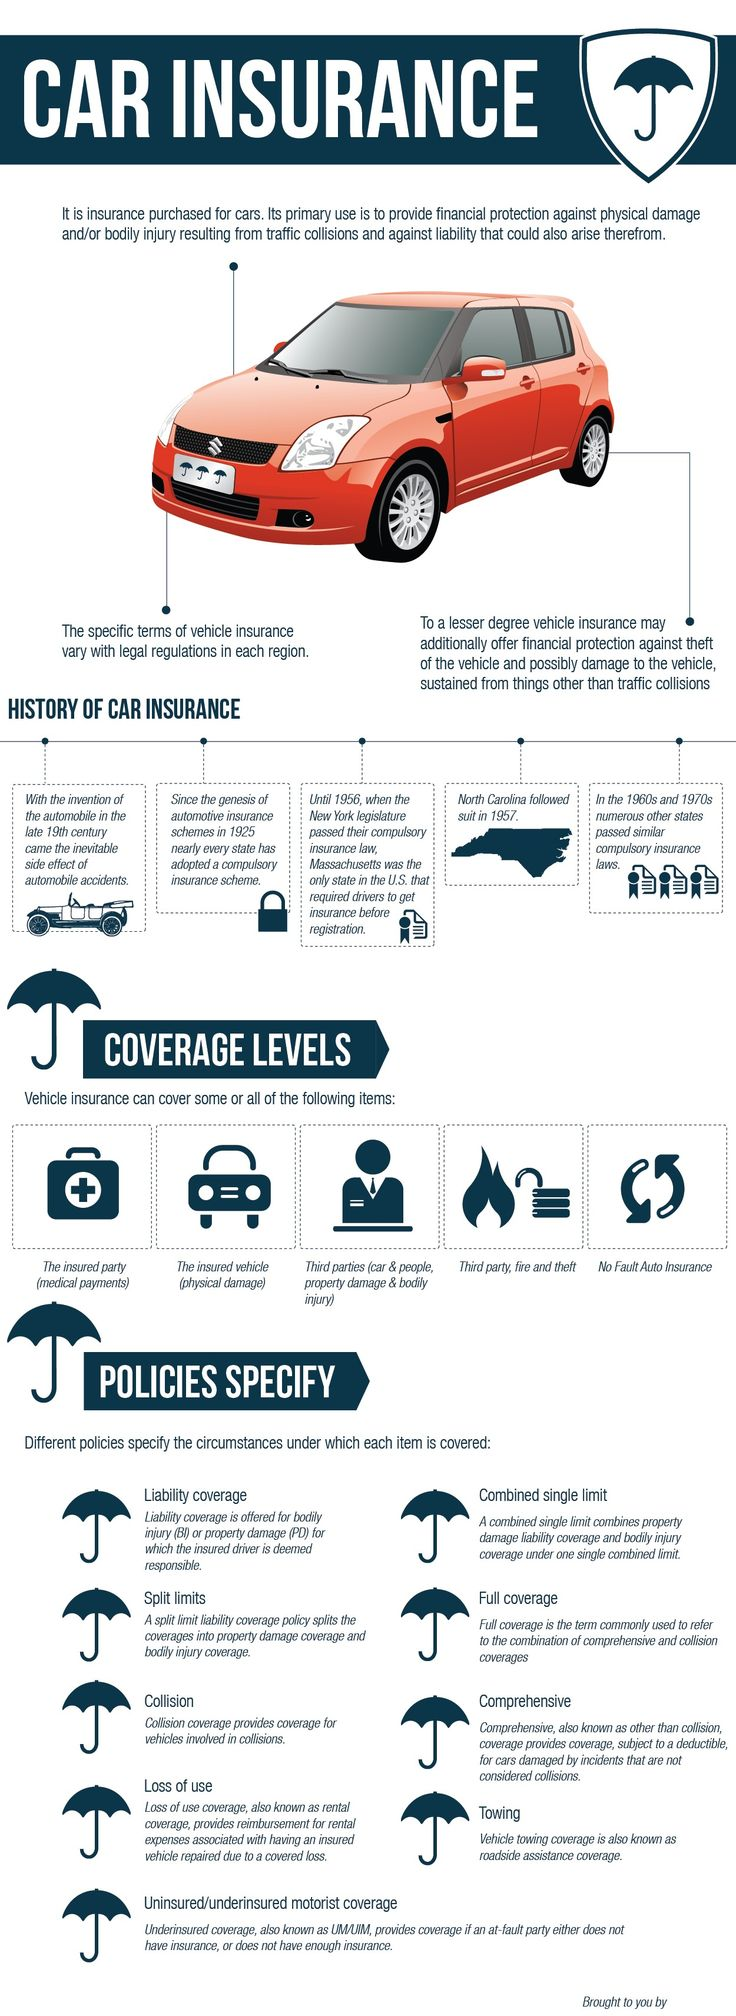 car insurance is important    #CarInsurancePompanoBeach